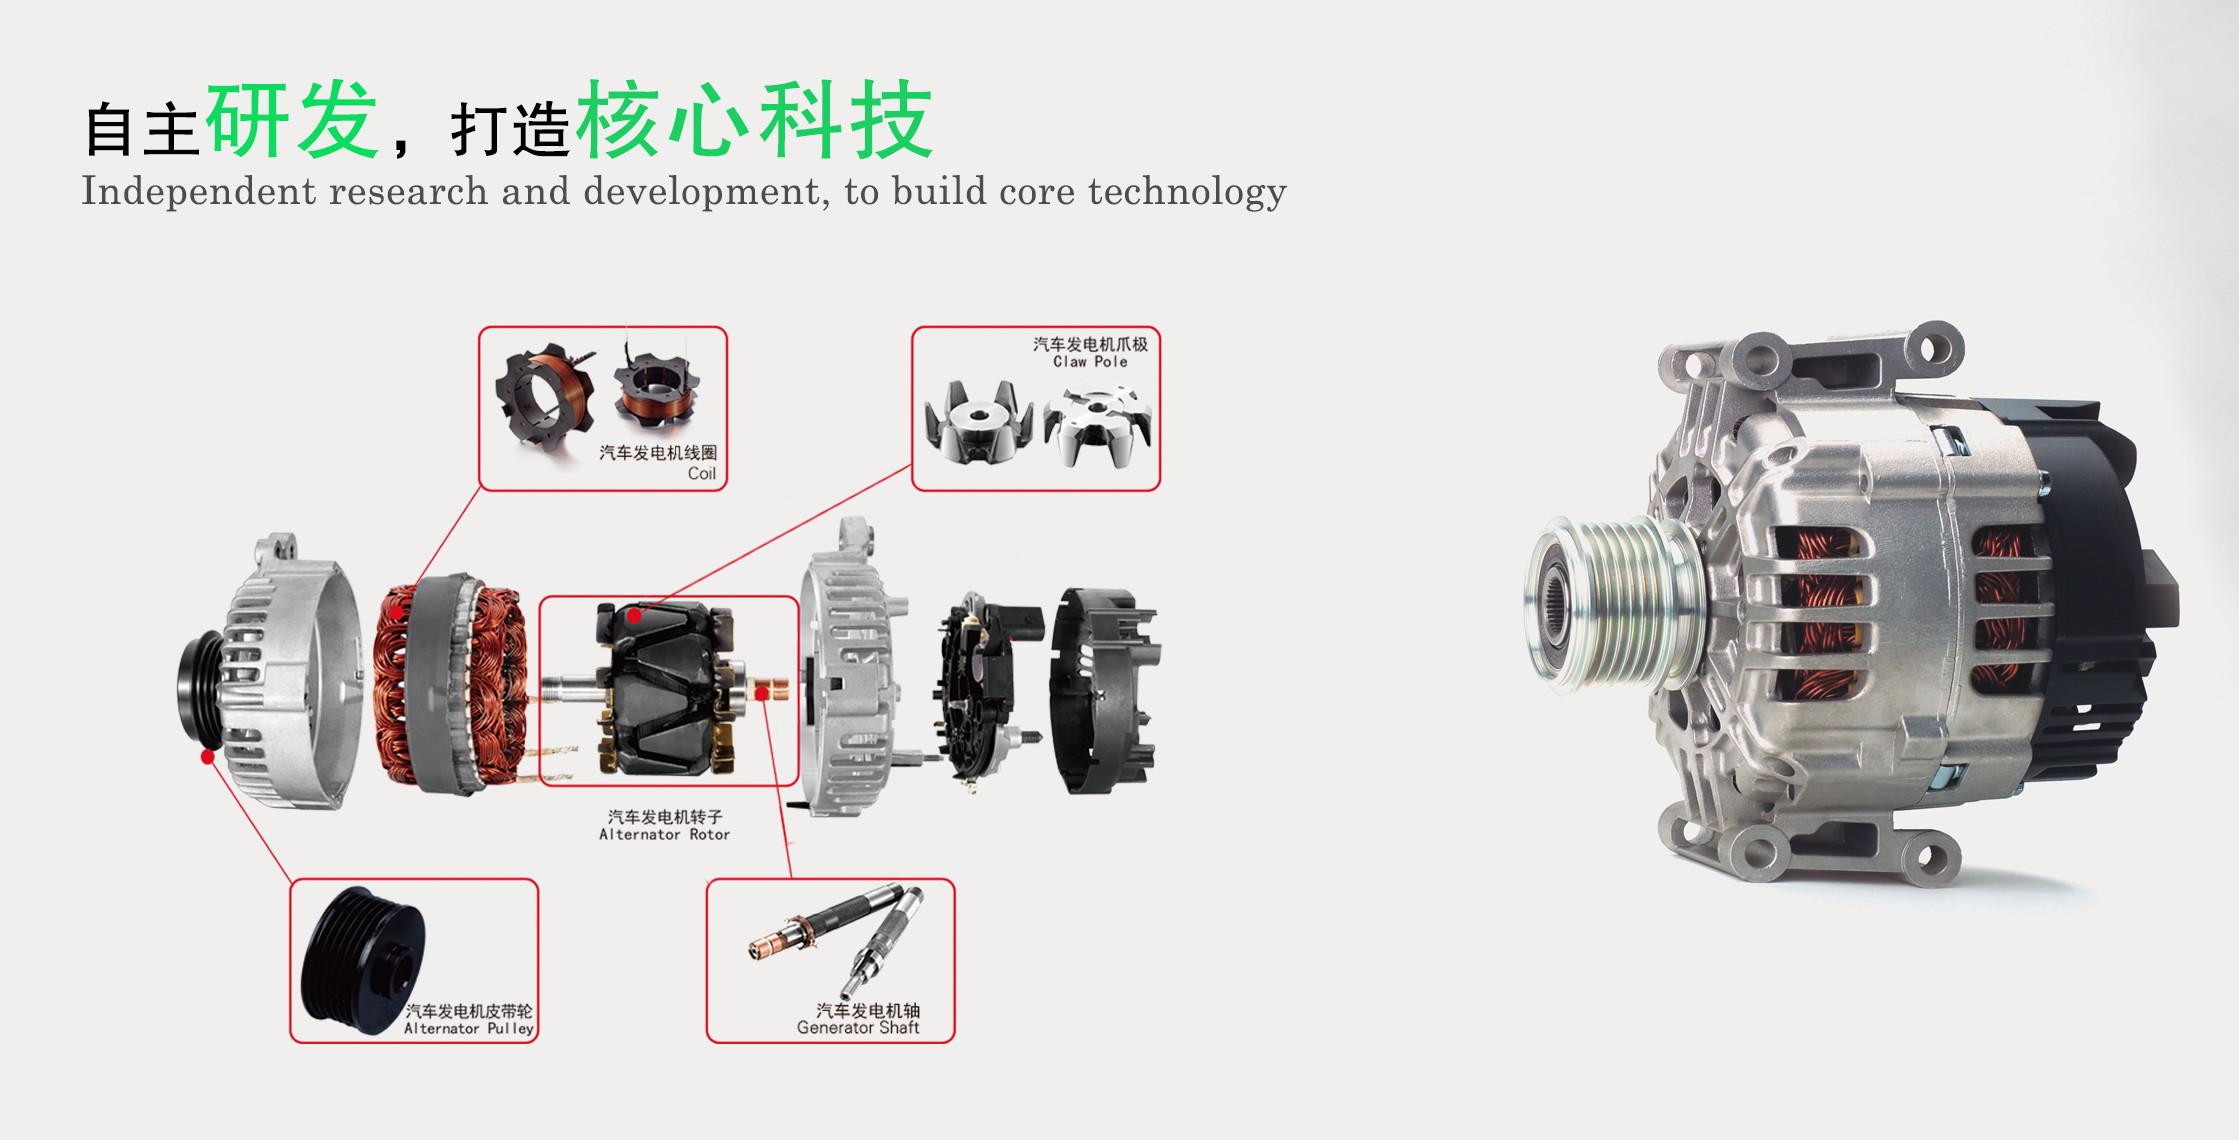 Car Alternator Dynamo Generators With Commutators Idokeren Com